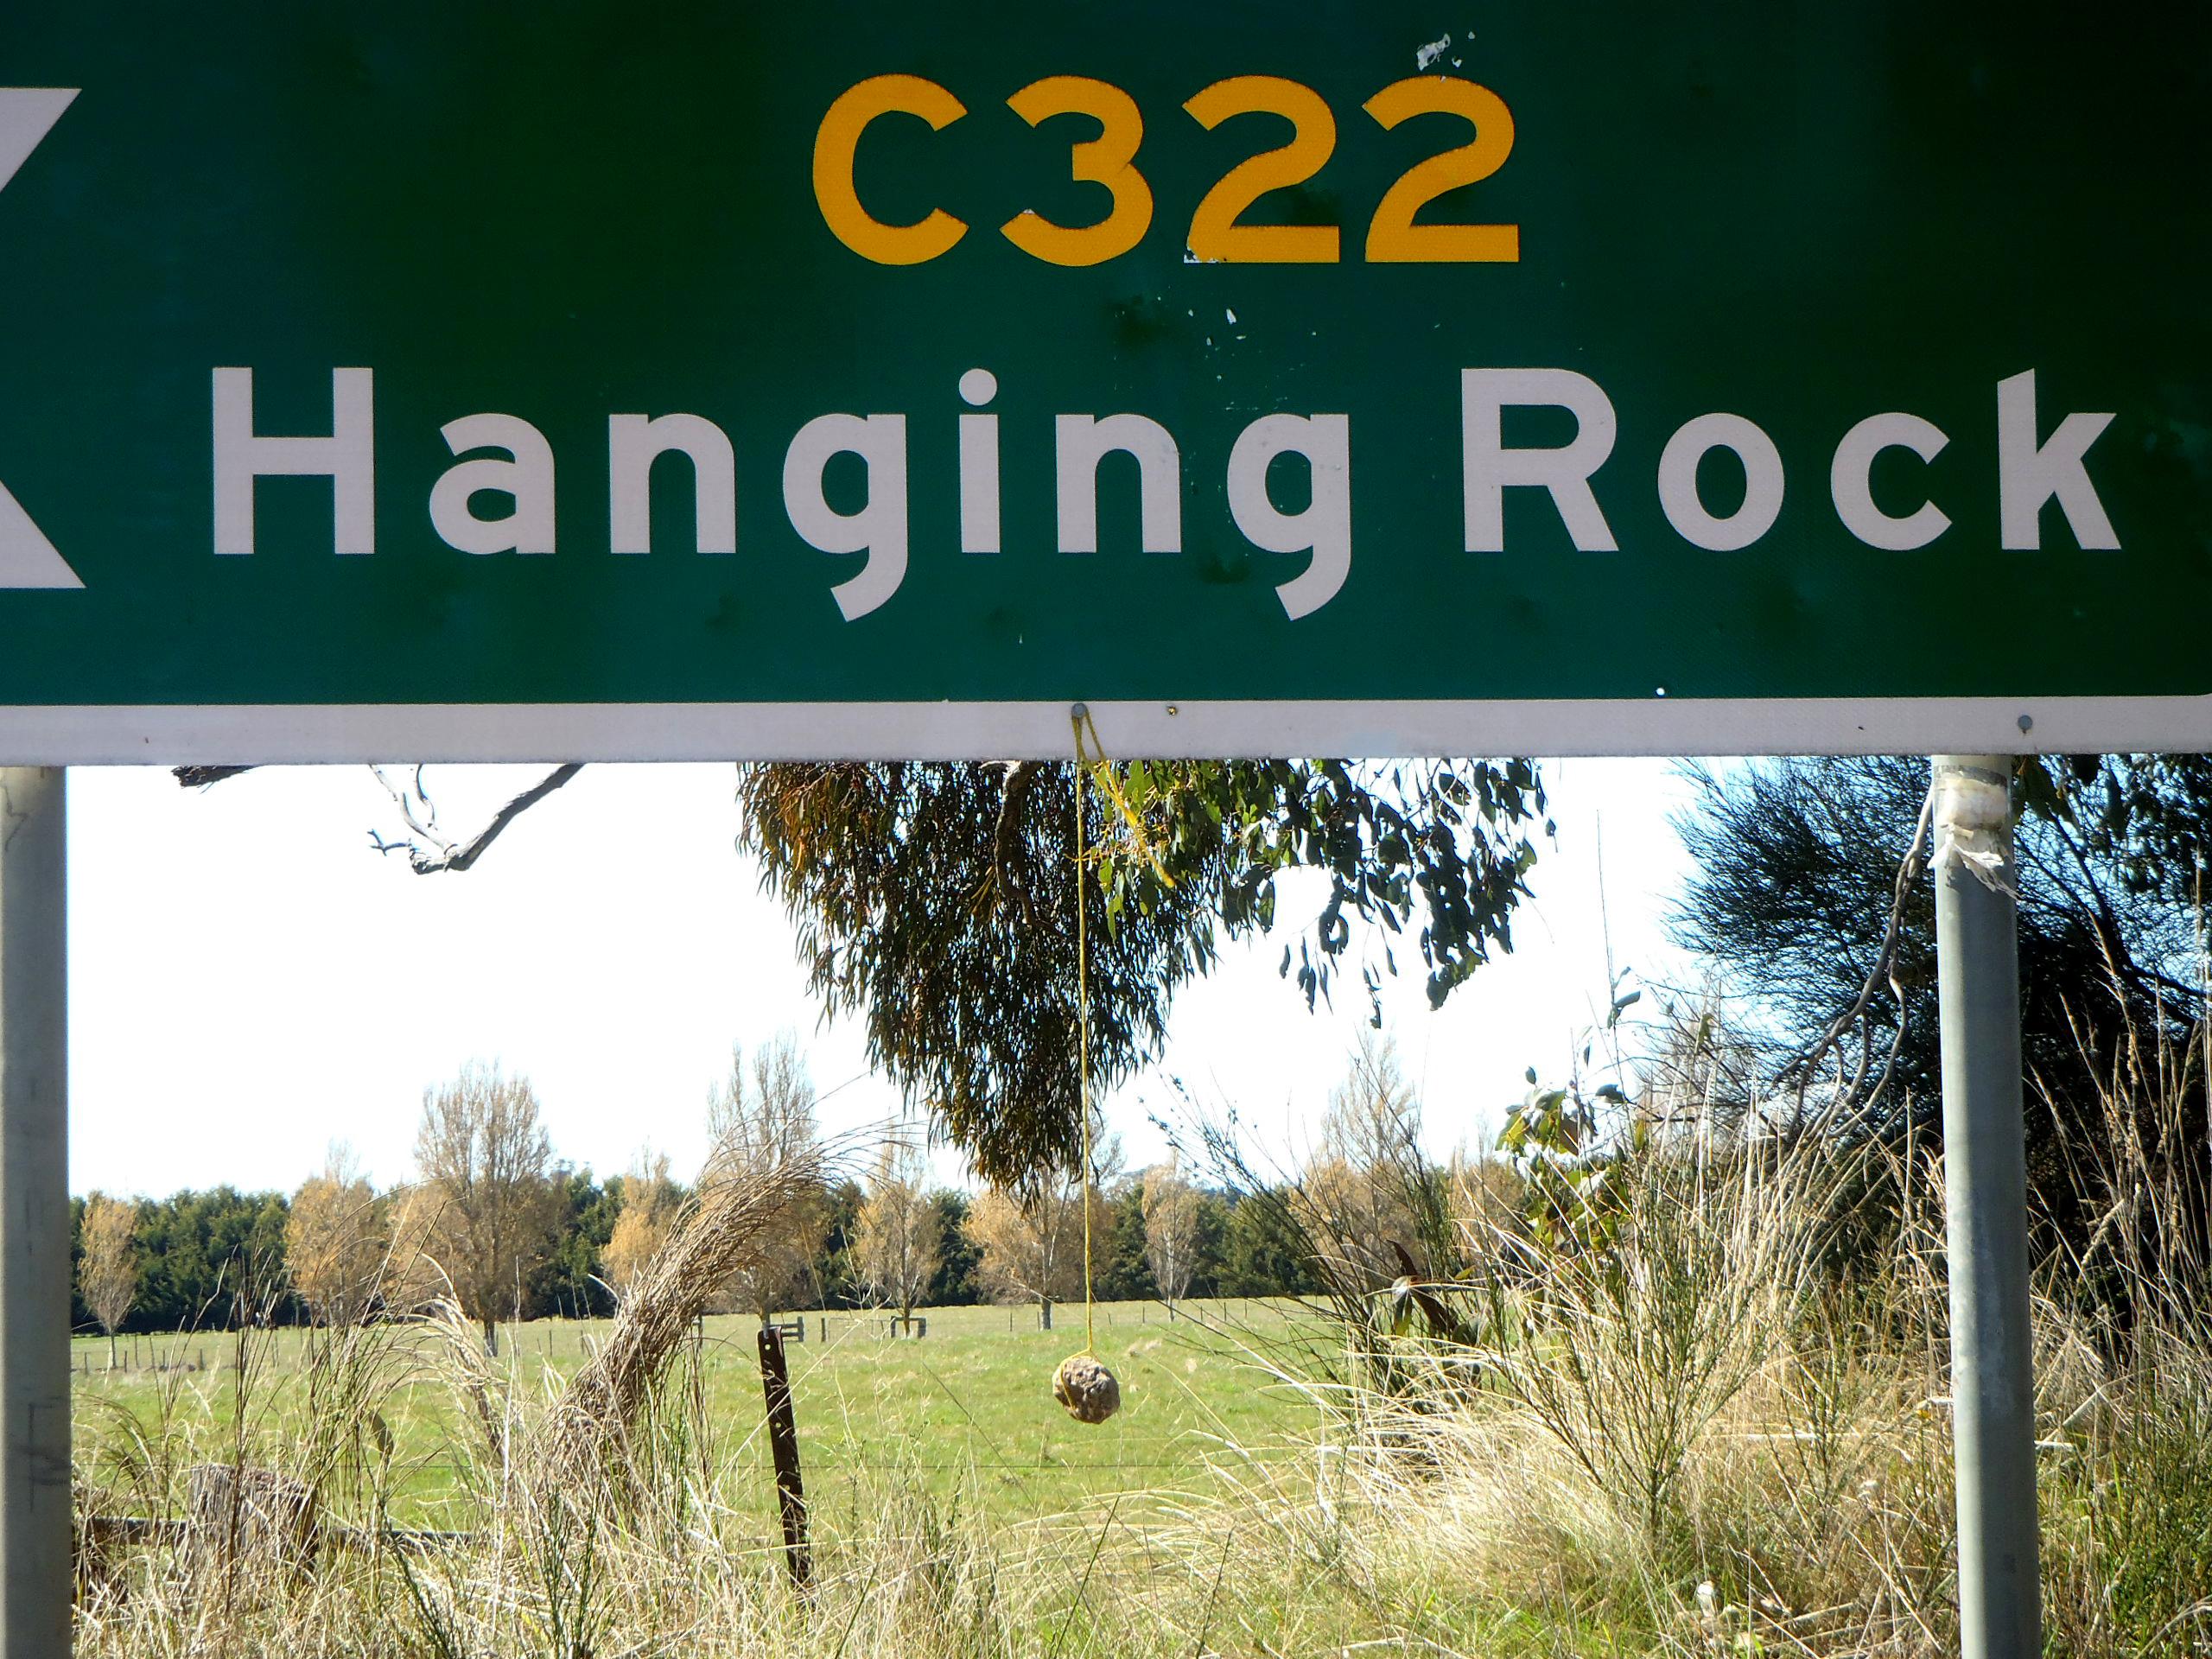 Hanging Rock Road Sign